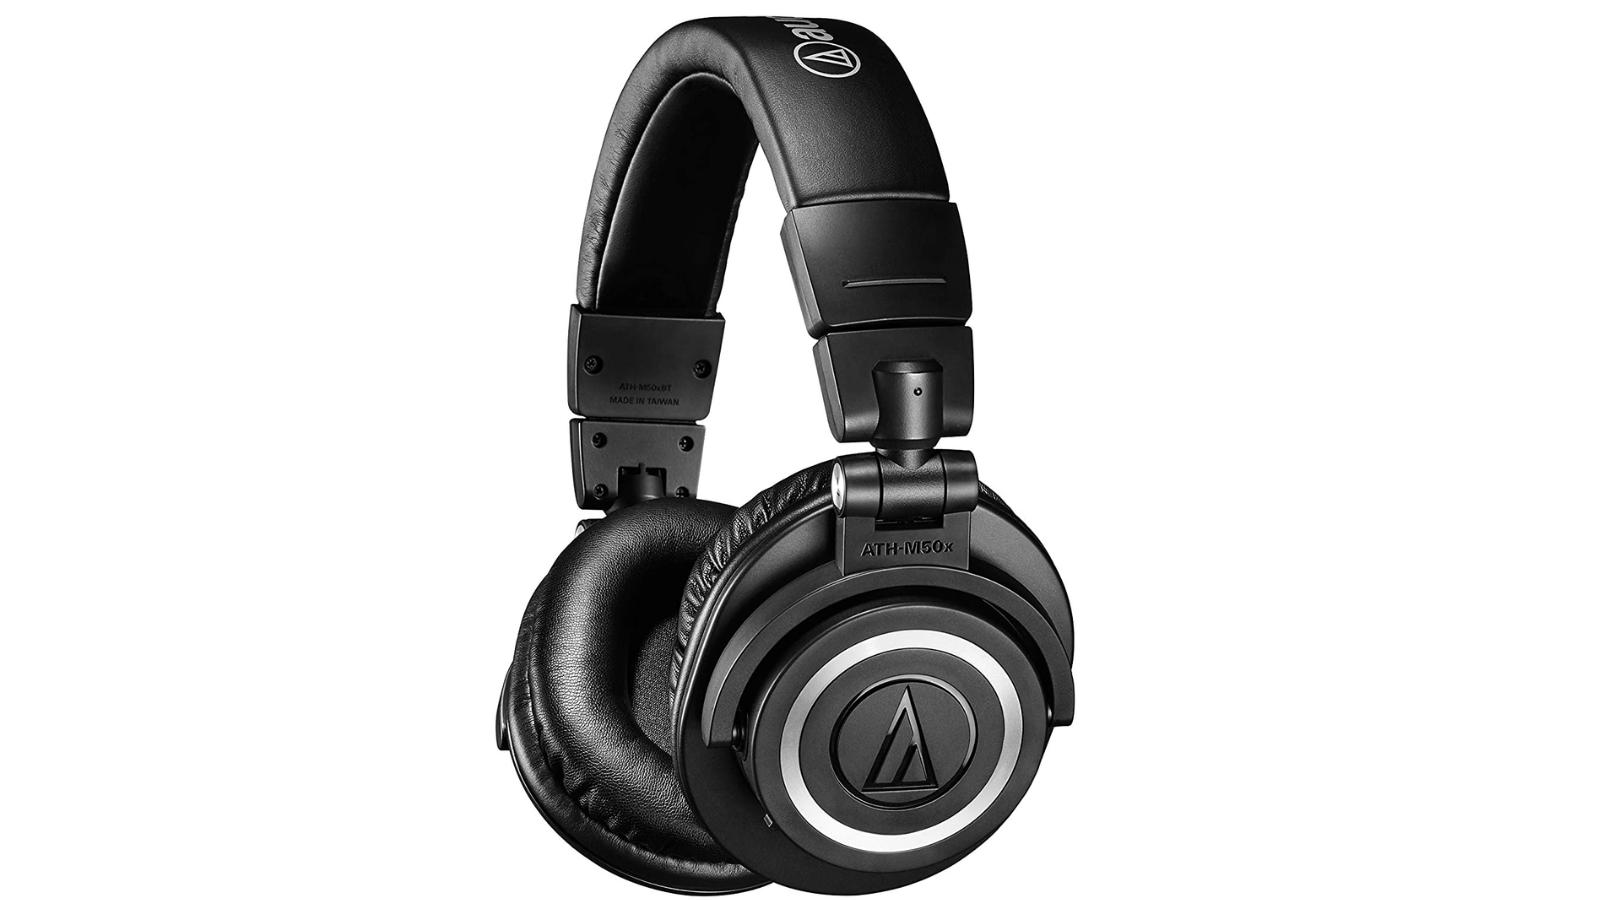 Audio-Technica M50xBT Bluetooth headphones